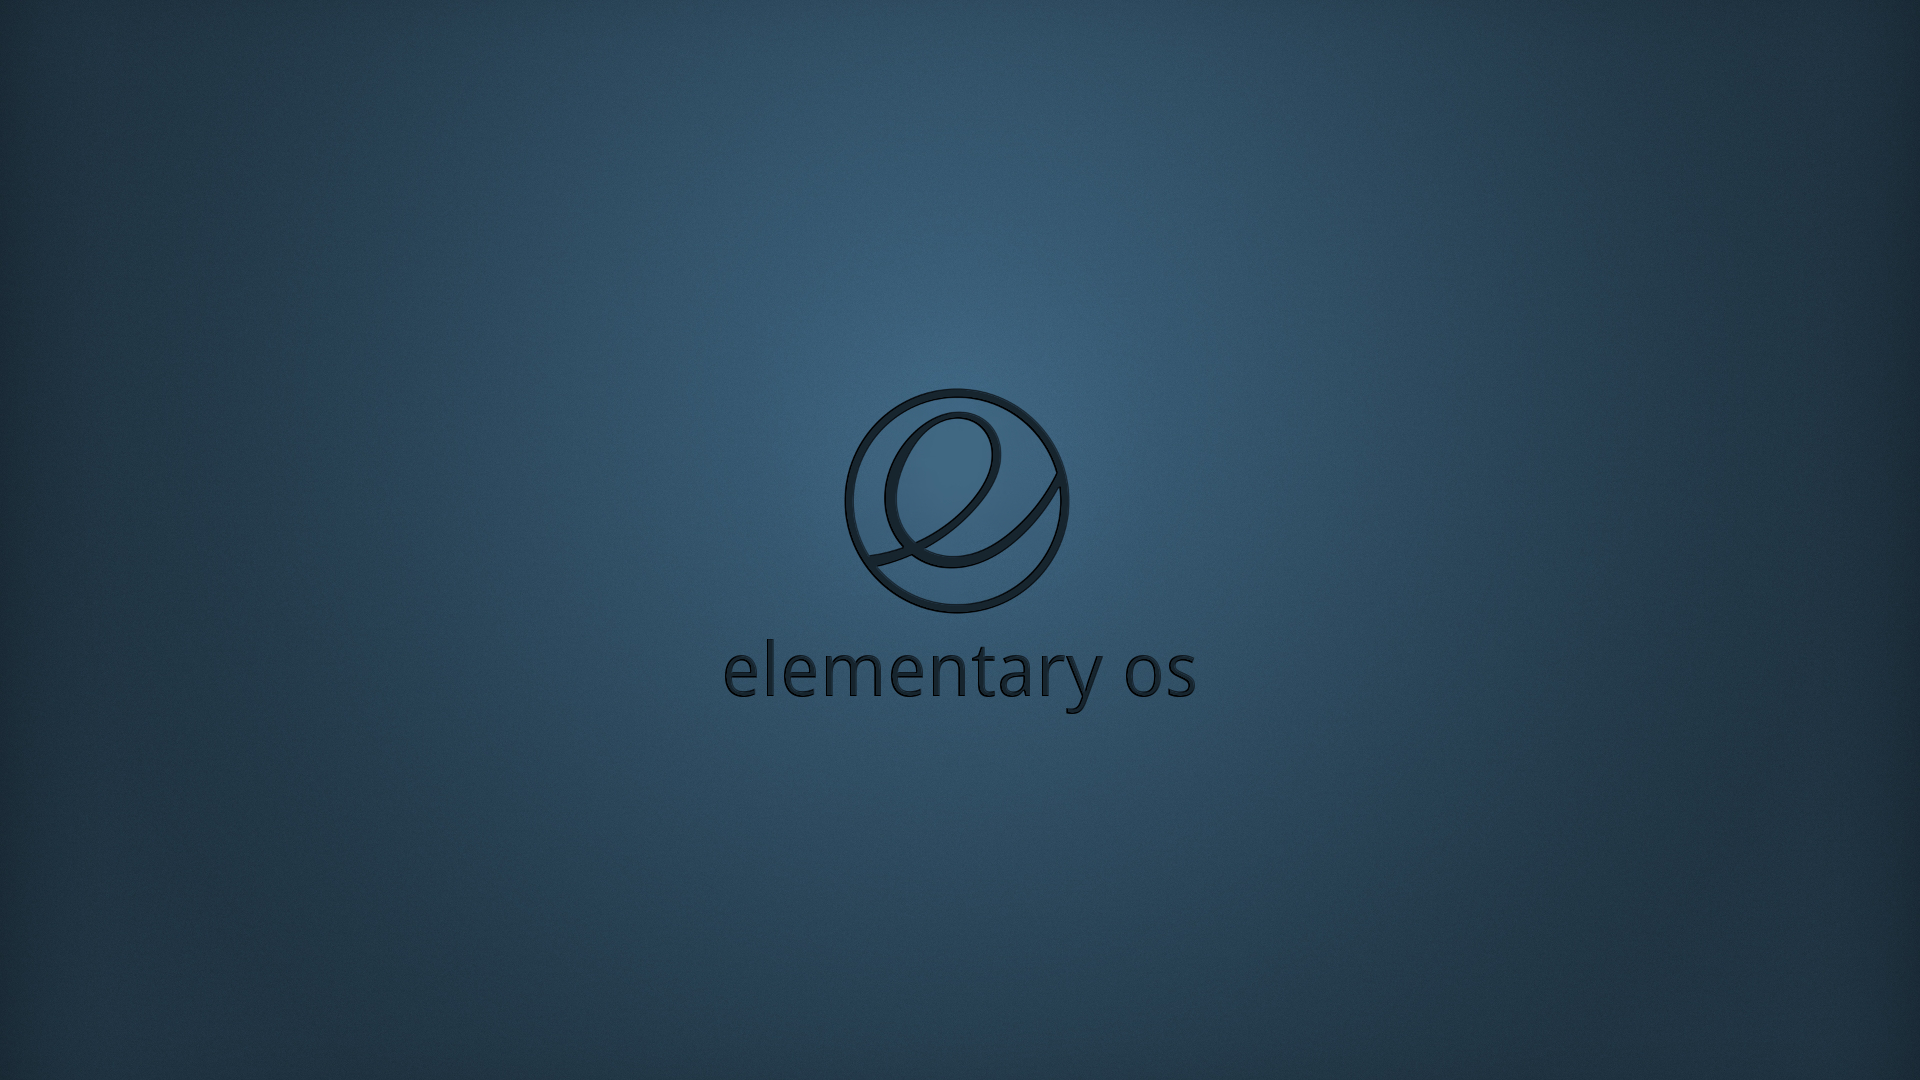 Elementary OS Install කරාට පස්සේ ….